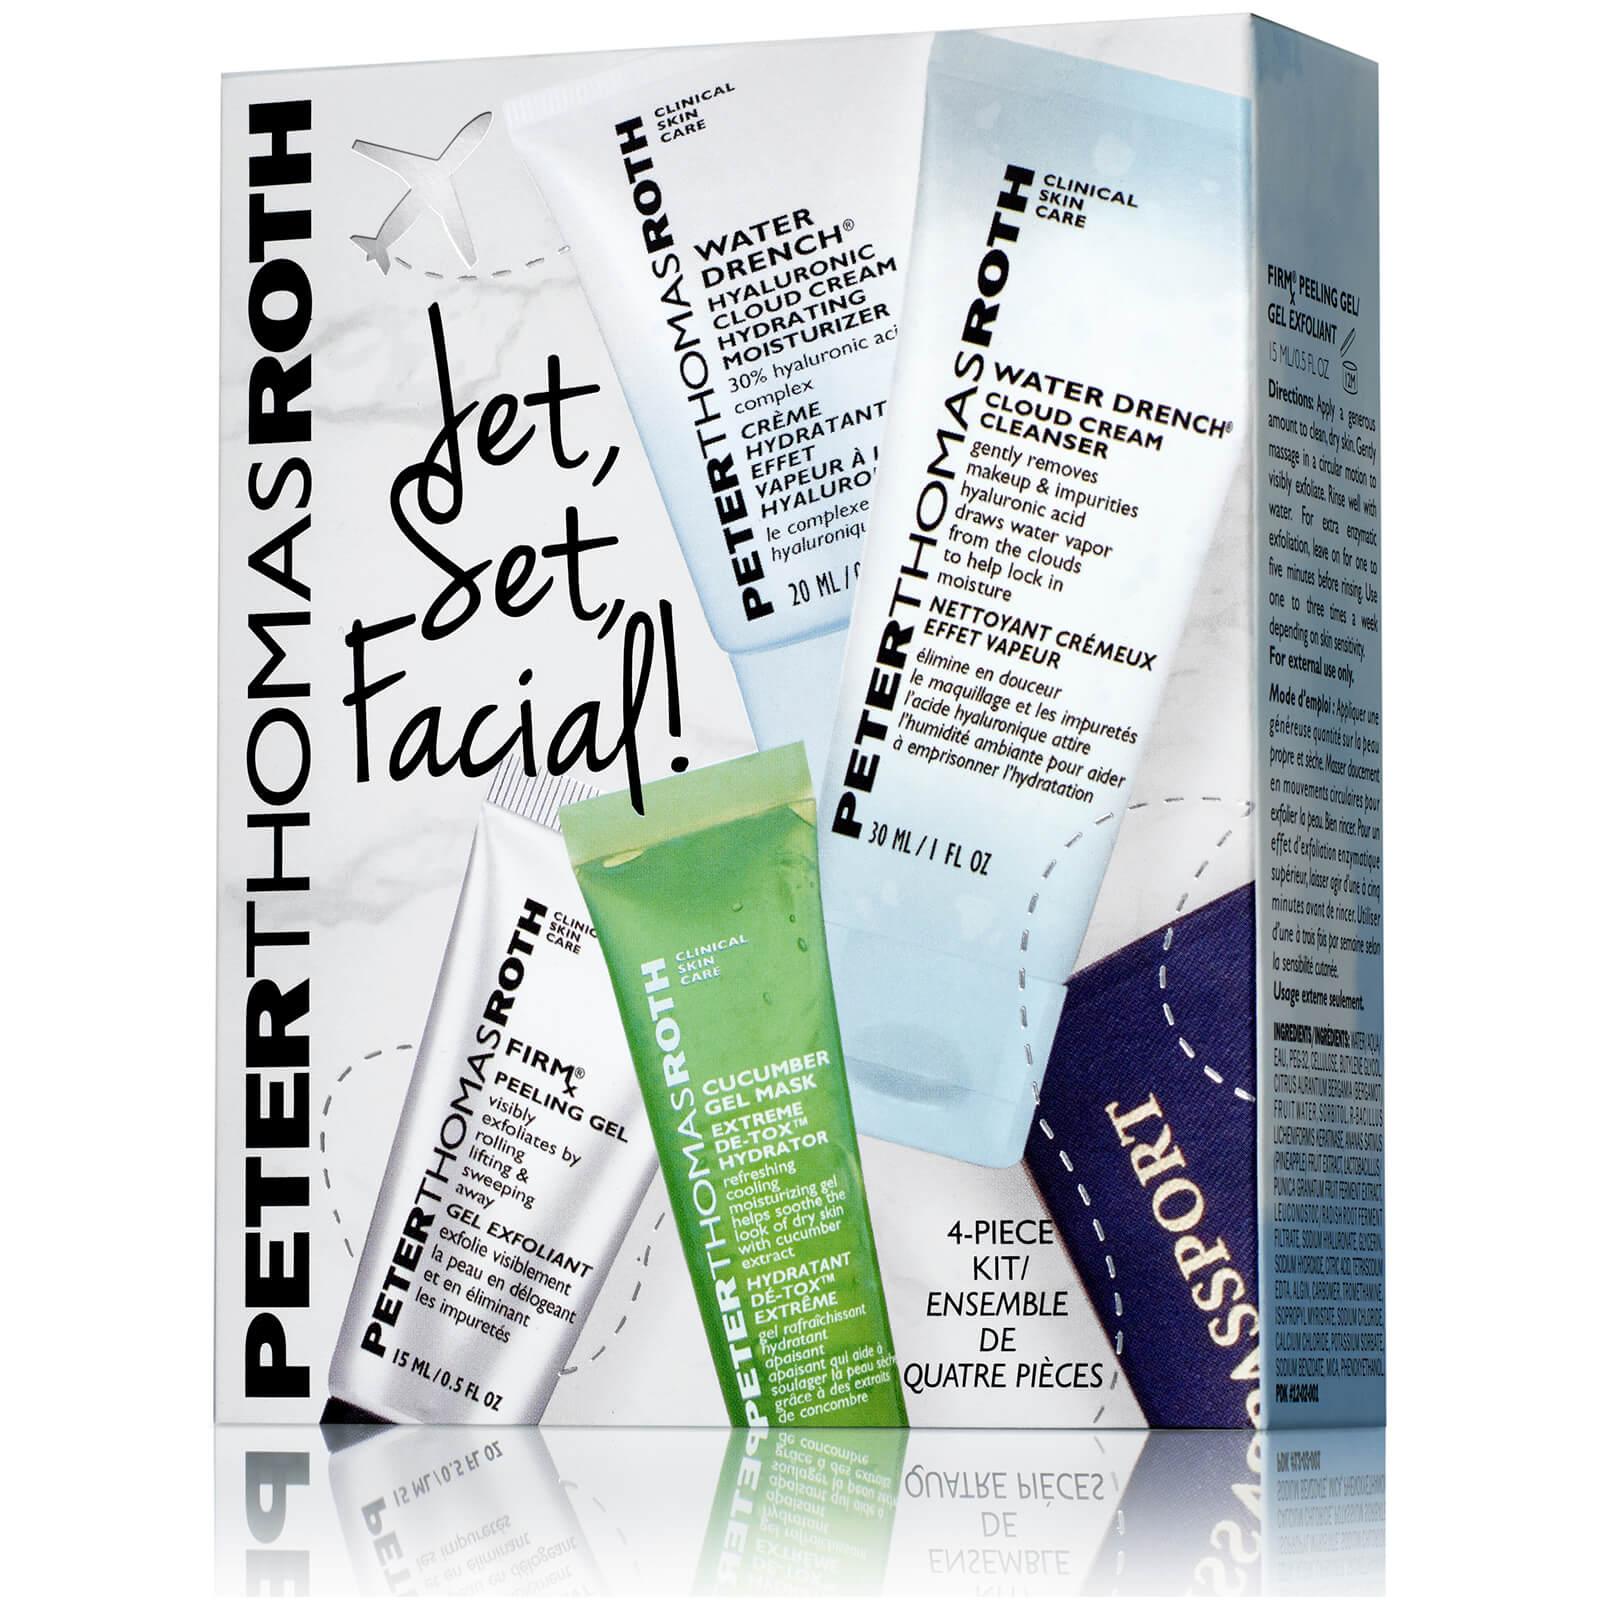 Peter Thomas Roth Jet Set Facial Kit (Worth £47 00)